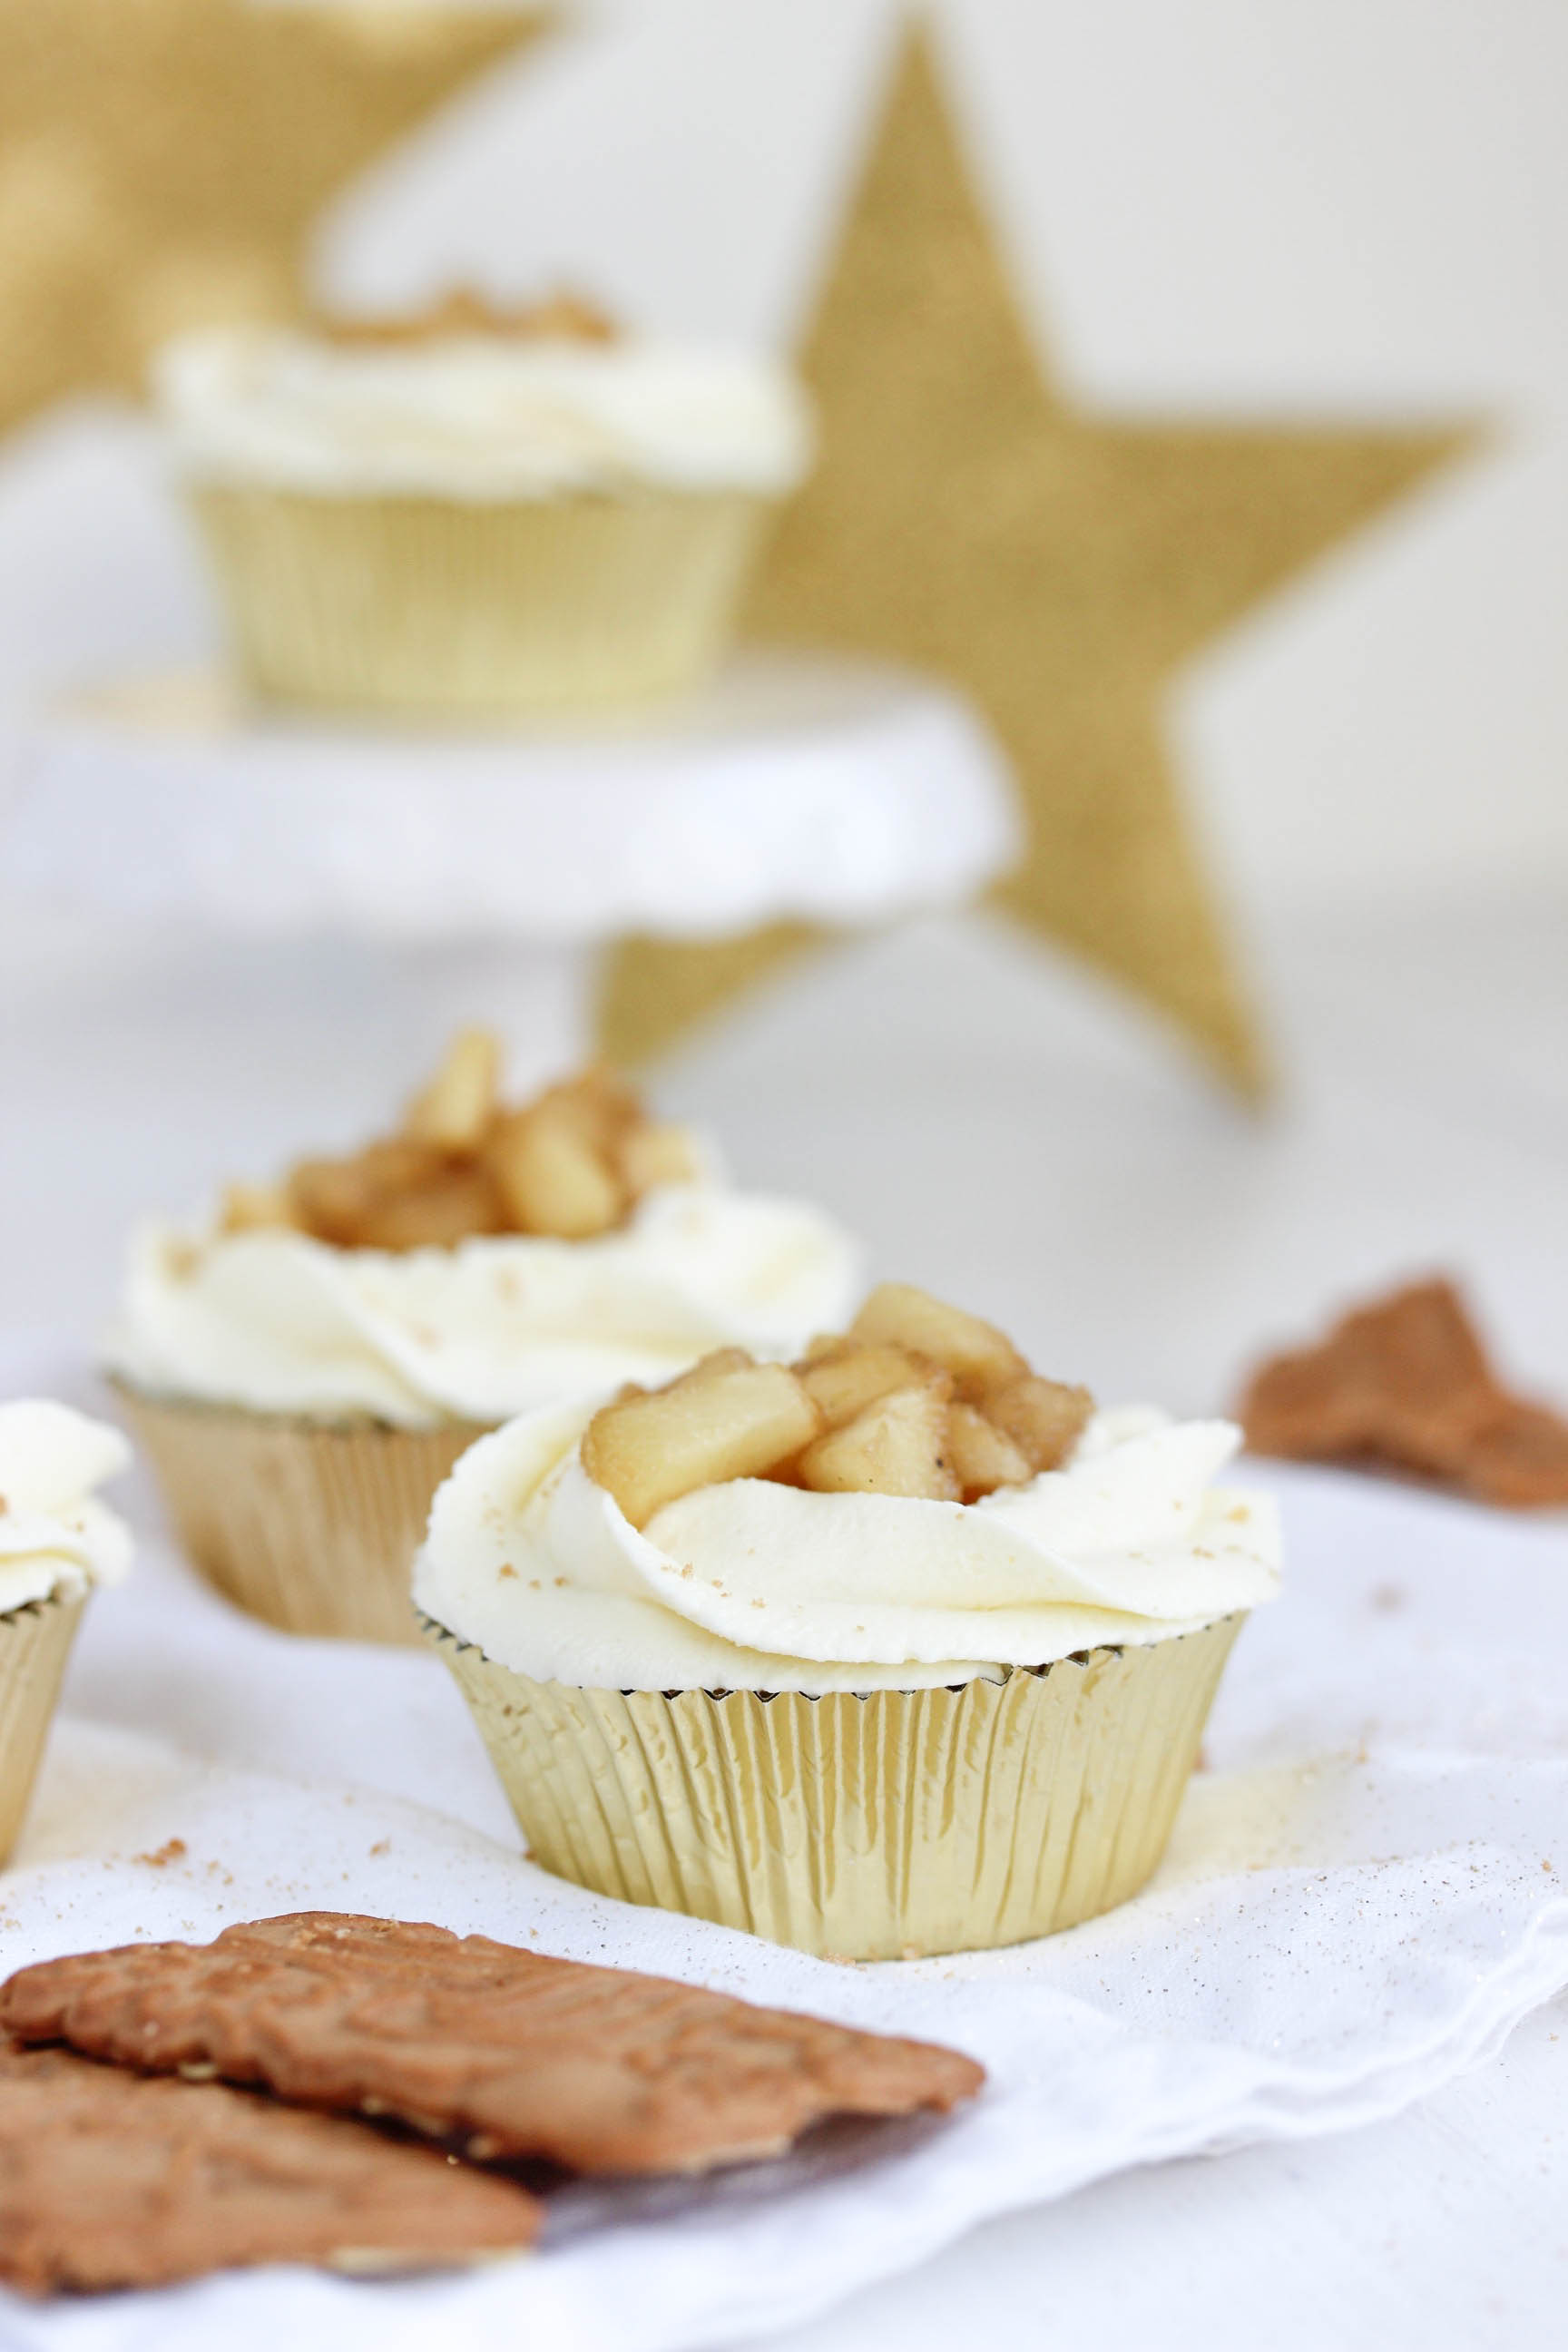 Leckere Apfel Spekulatius Cupcakes Weihnachten Advent backen Rezept